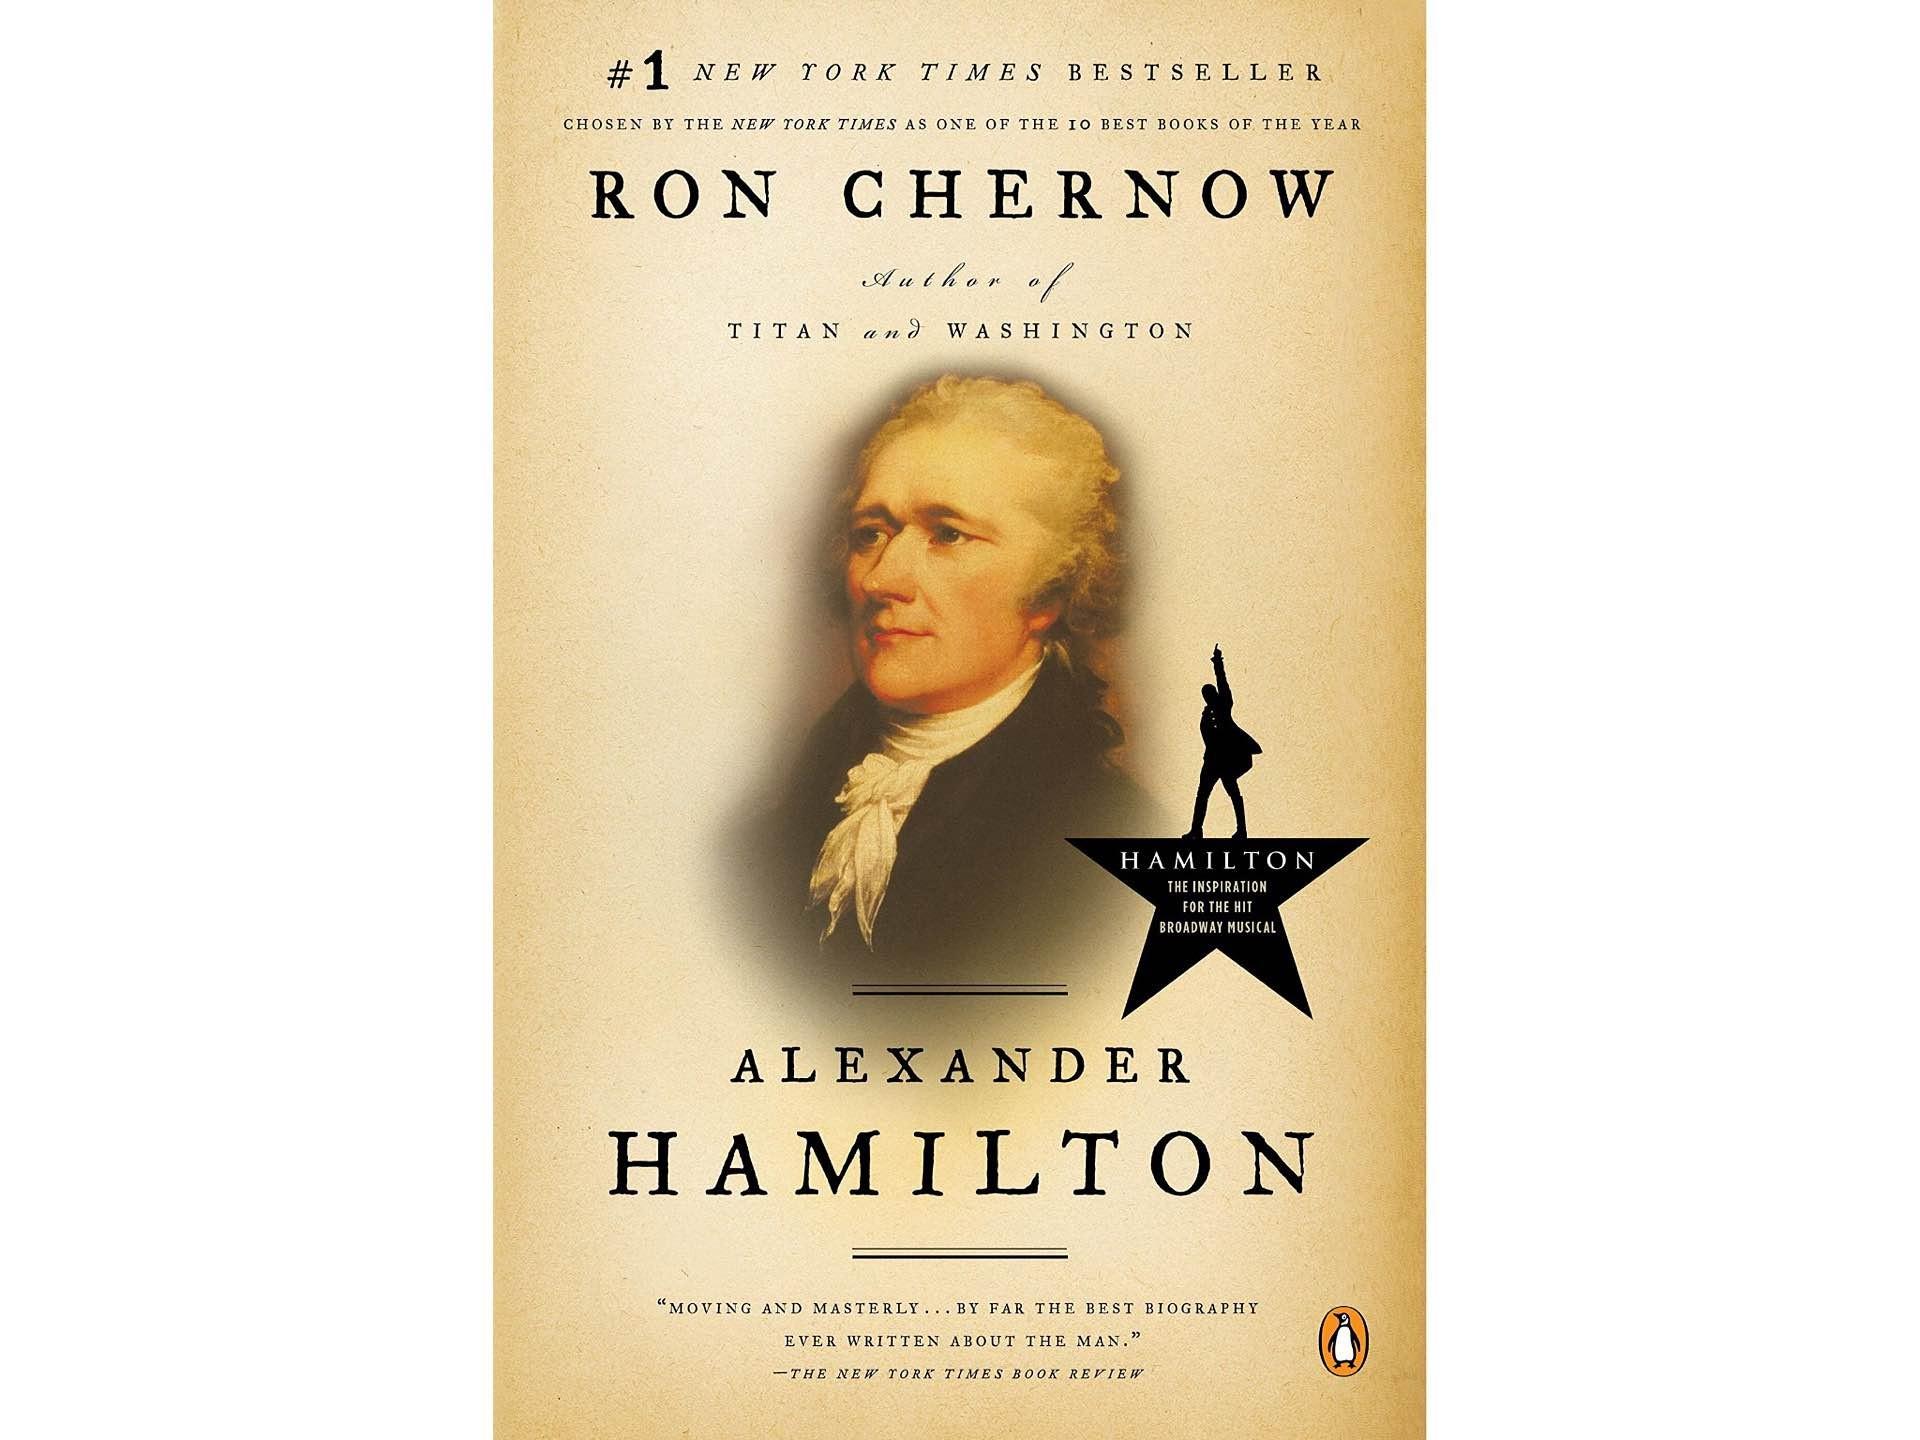 Alexander Hamilton by Ron Chernow.